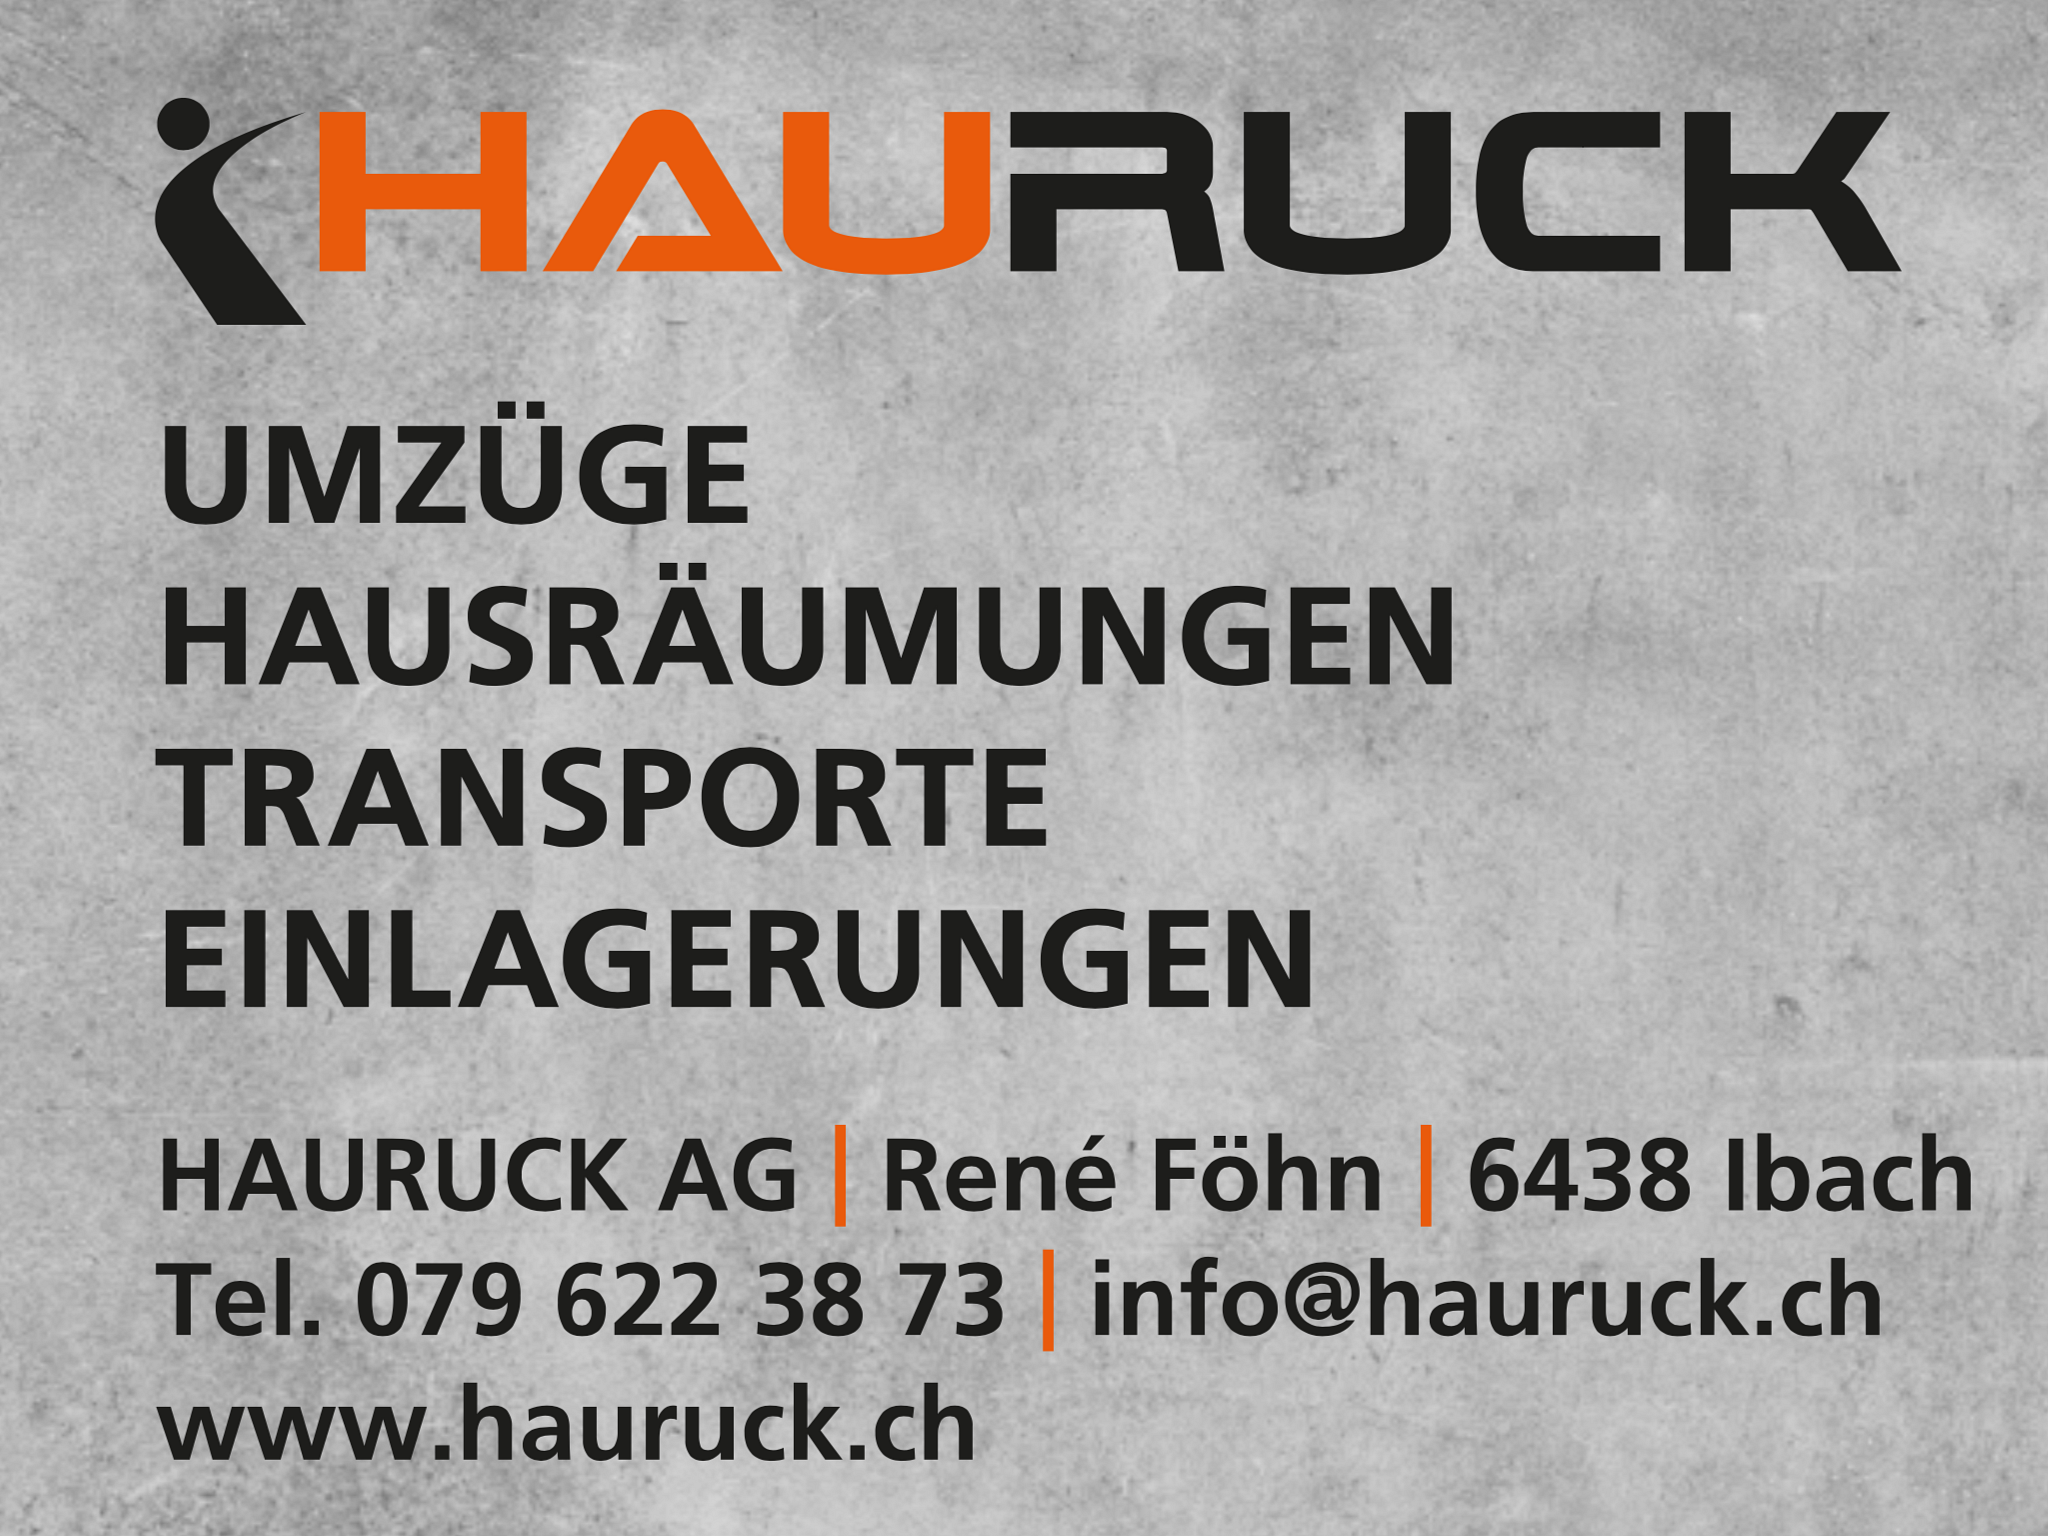 Hauruck AG